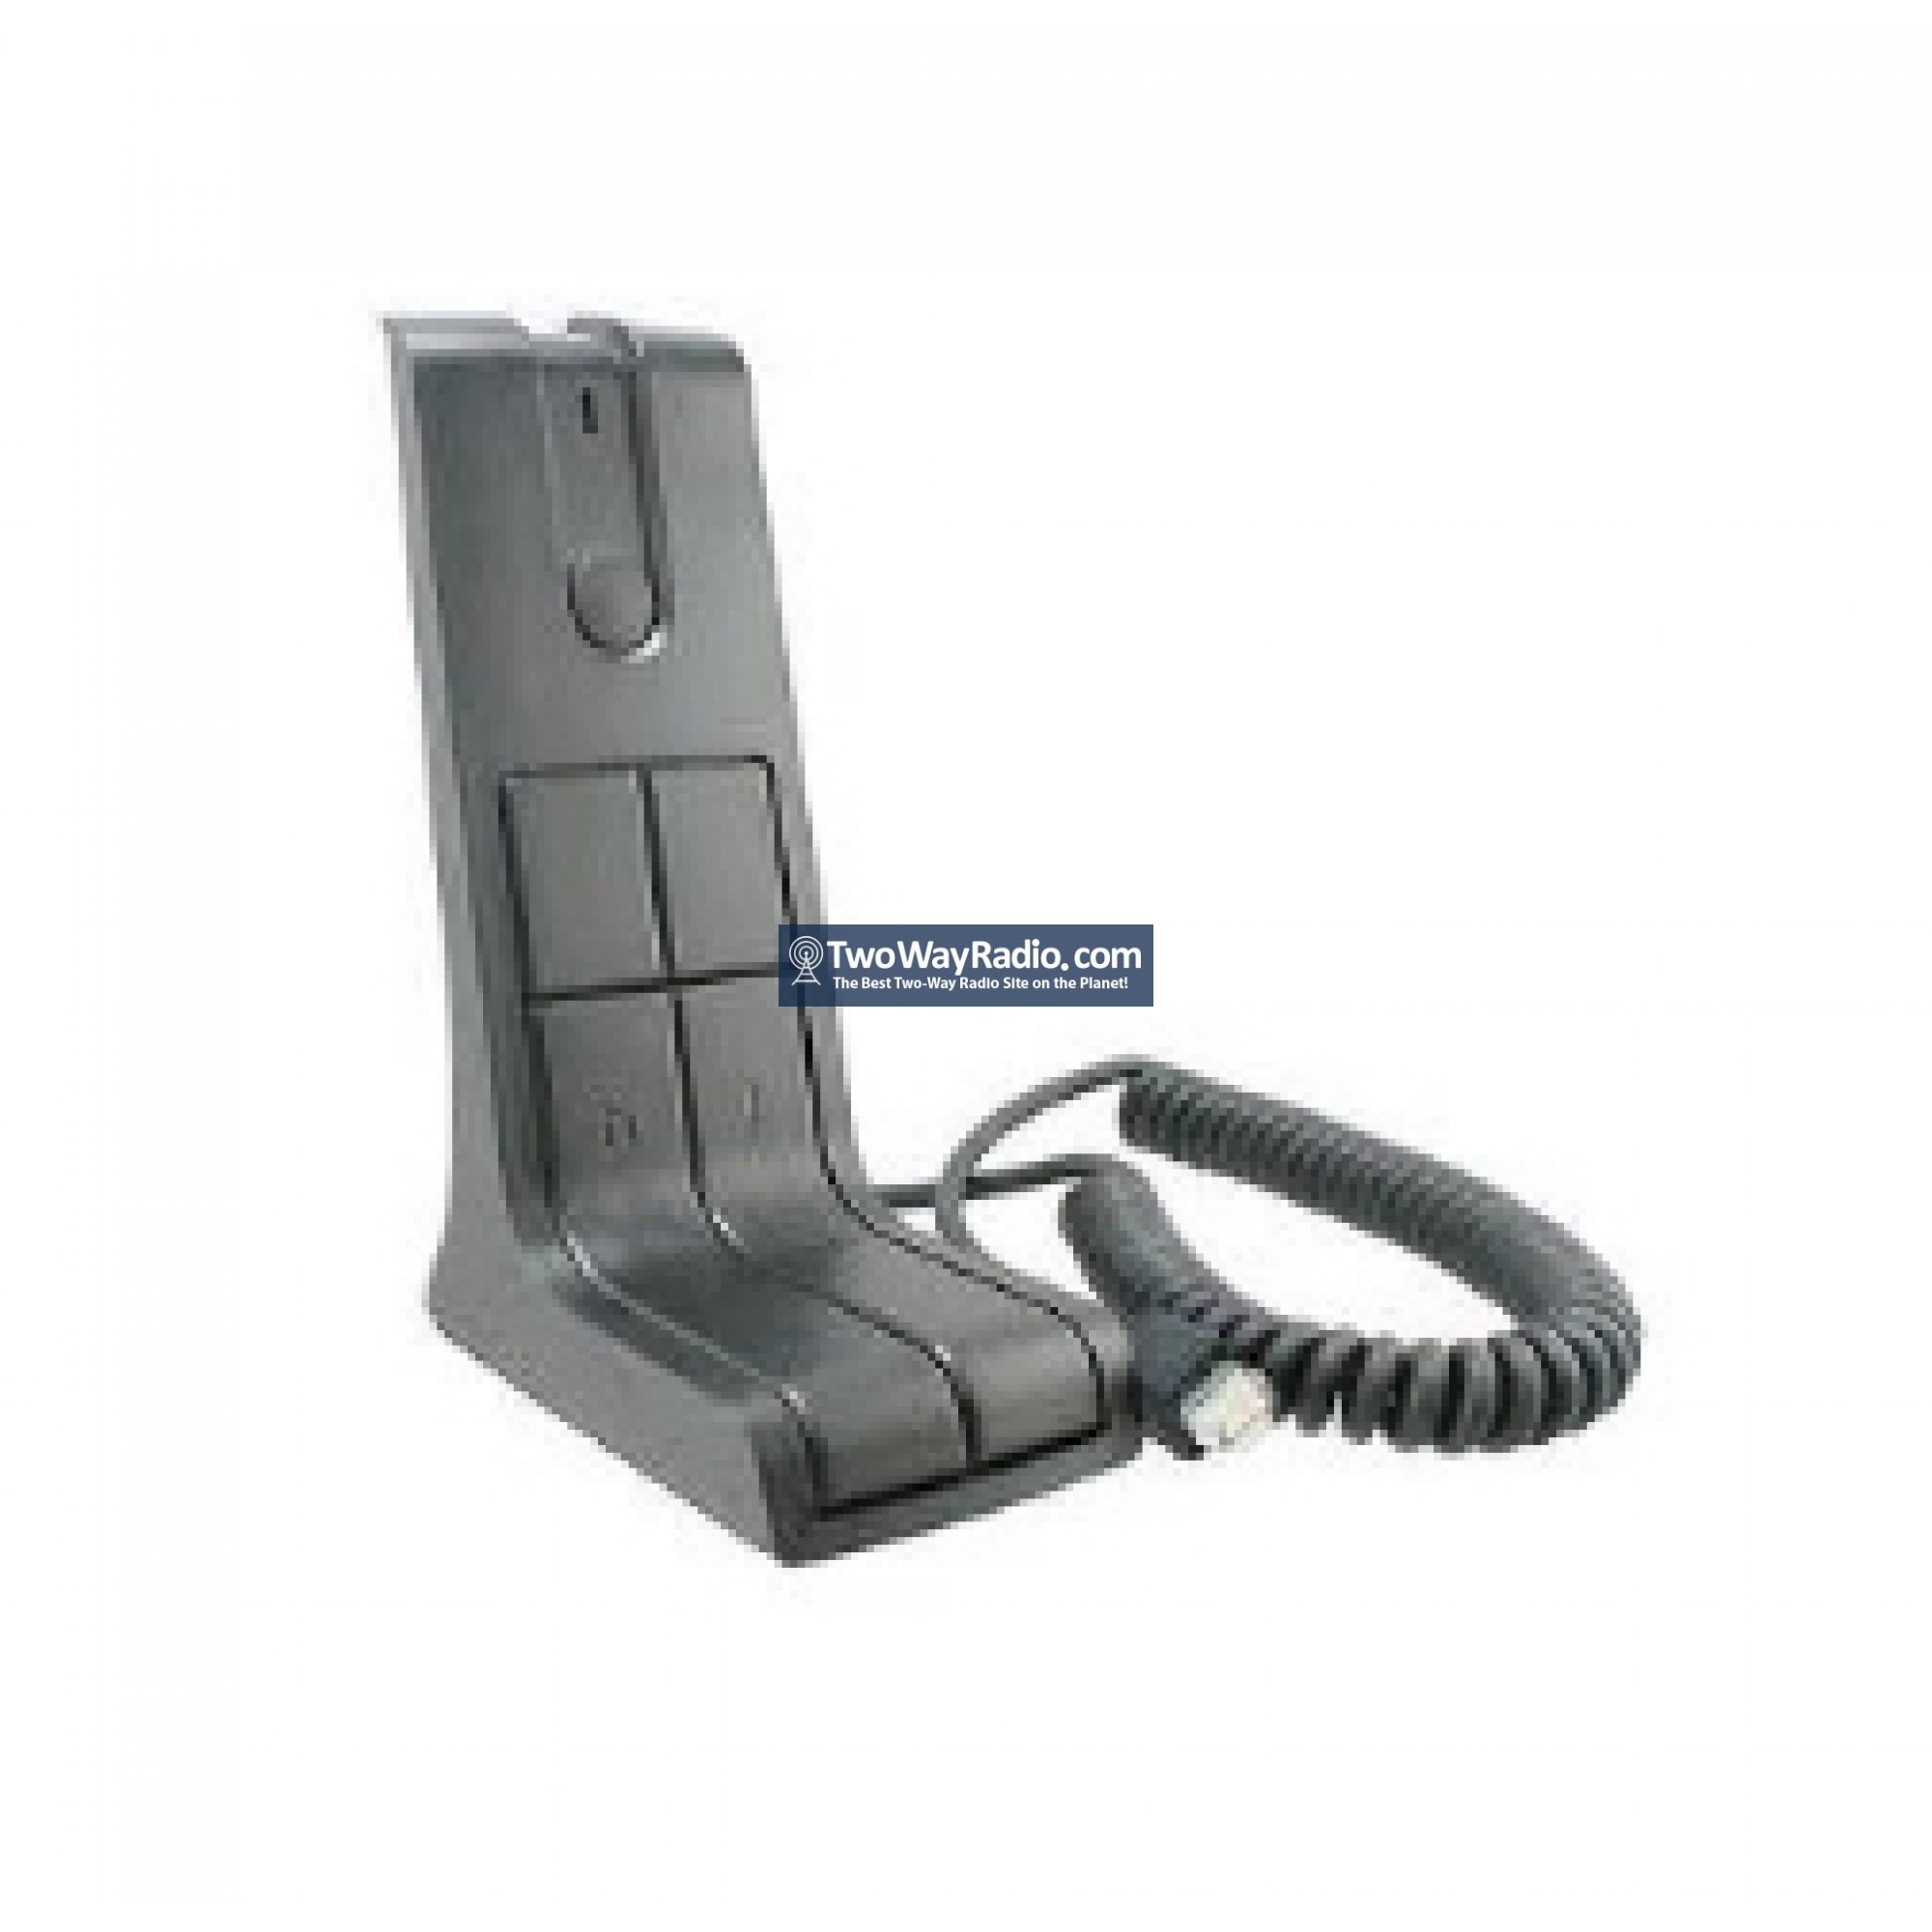 Buy Here Motorola Rmn5068 Desktop Microphone Twowayradio Com